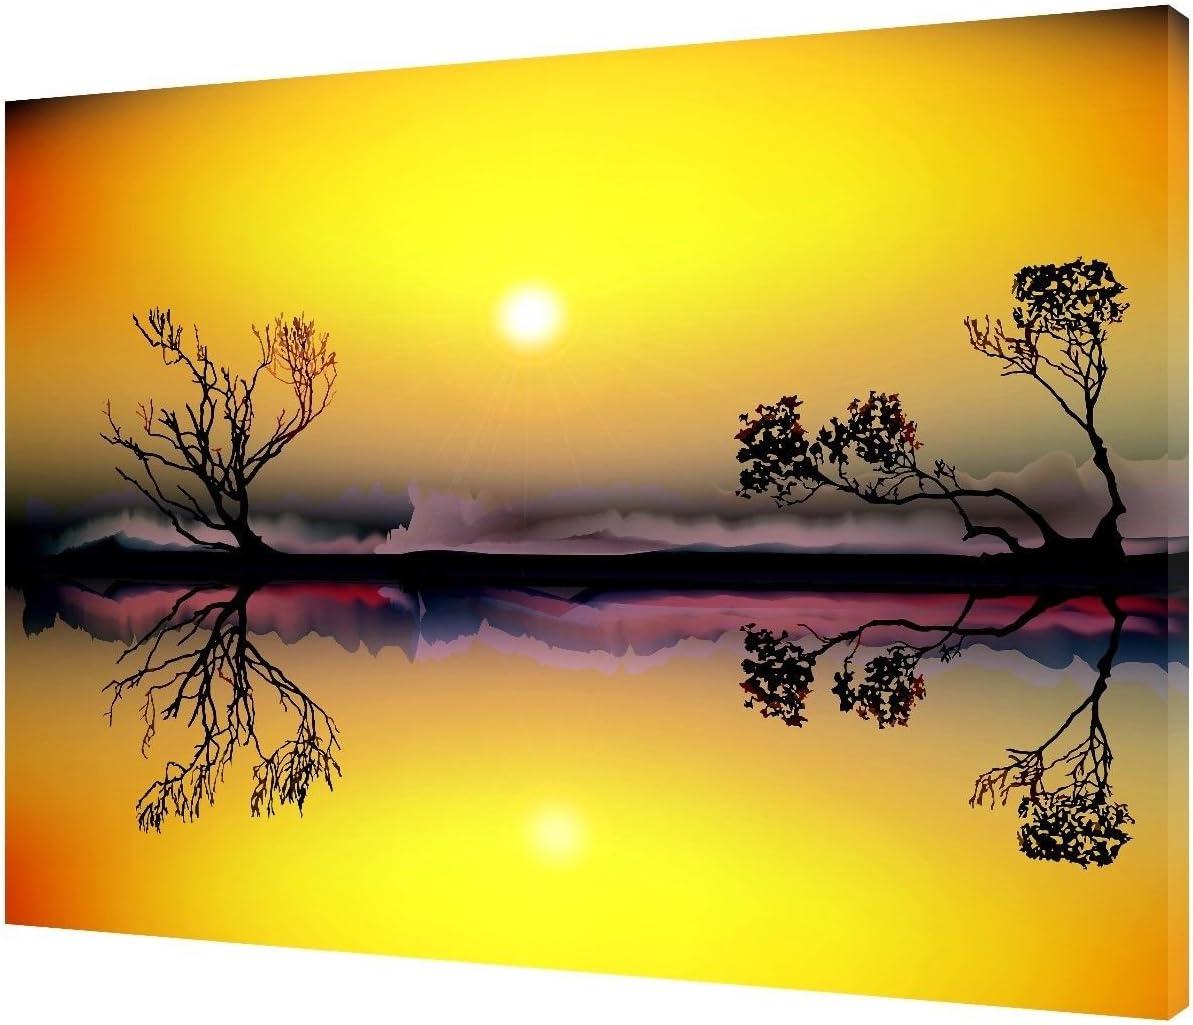 SUNRISE LANDSCAPE //YELLOW PHOTO PRINT ON FRAMED CANVAS WALL ART 12x 8inch 38mm depth